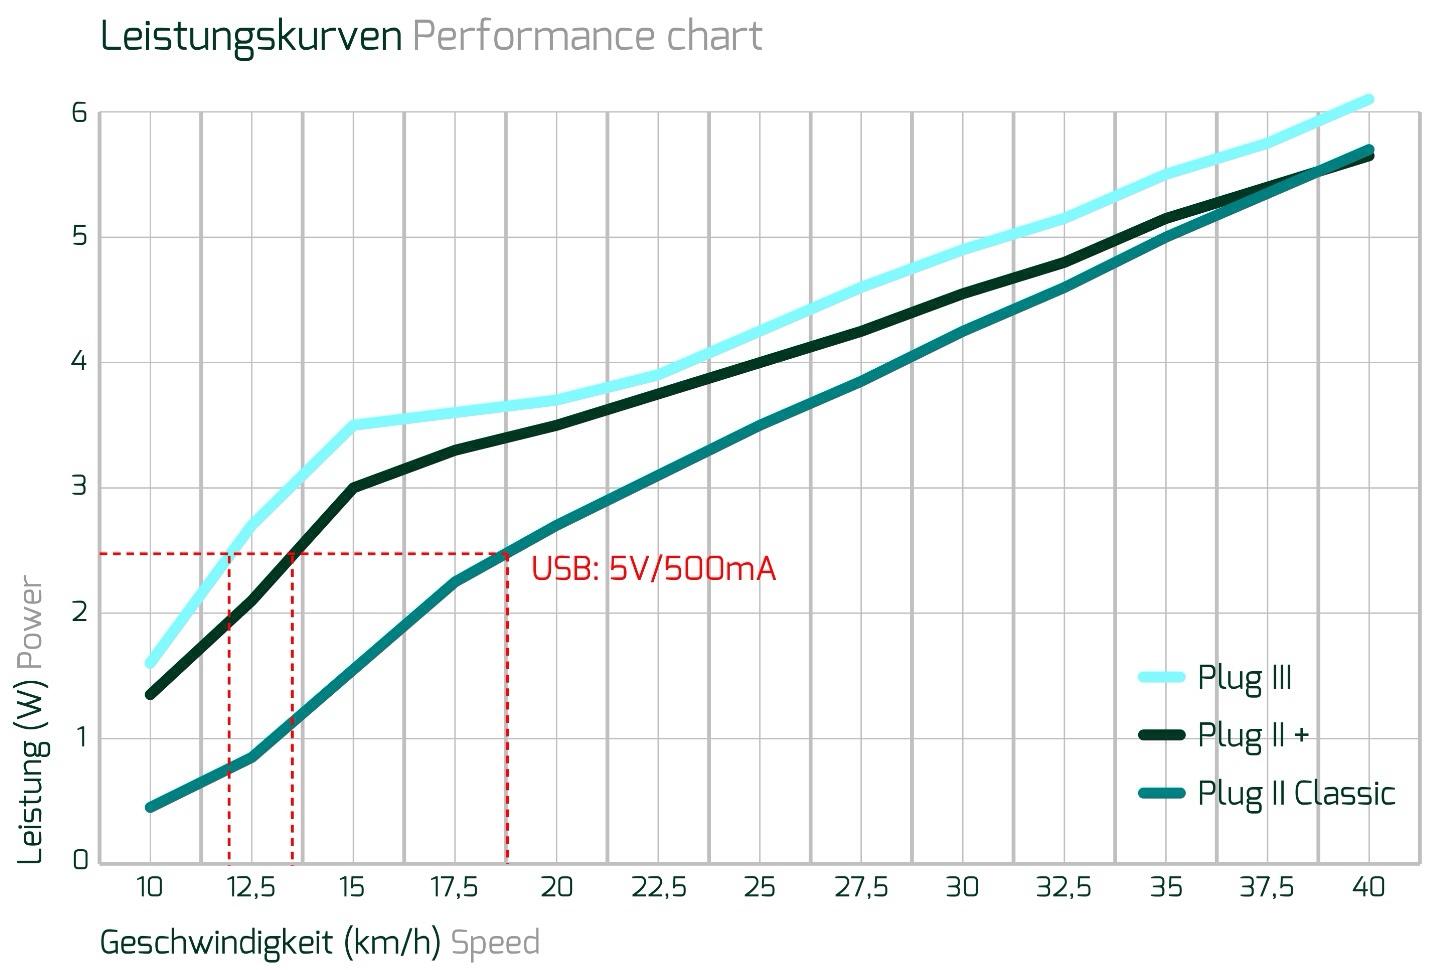 Tout terrain The plug III performance chart